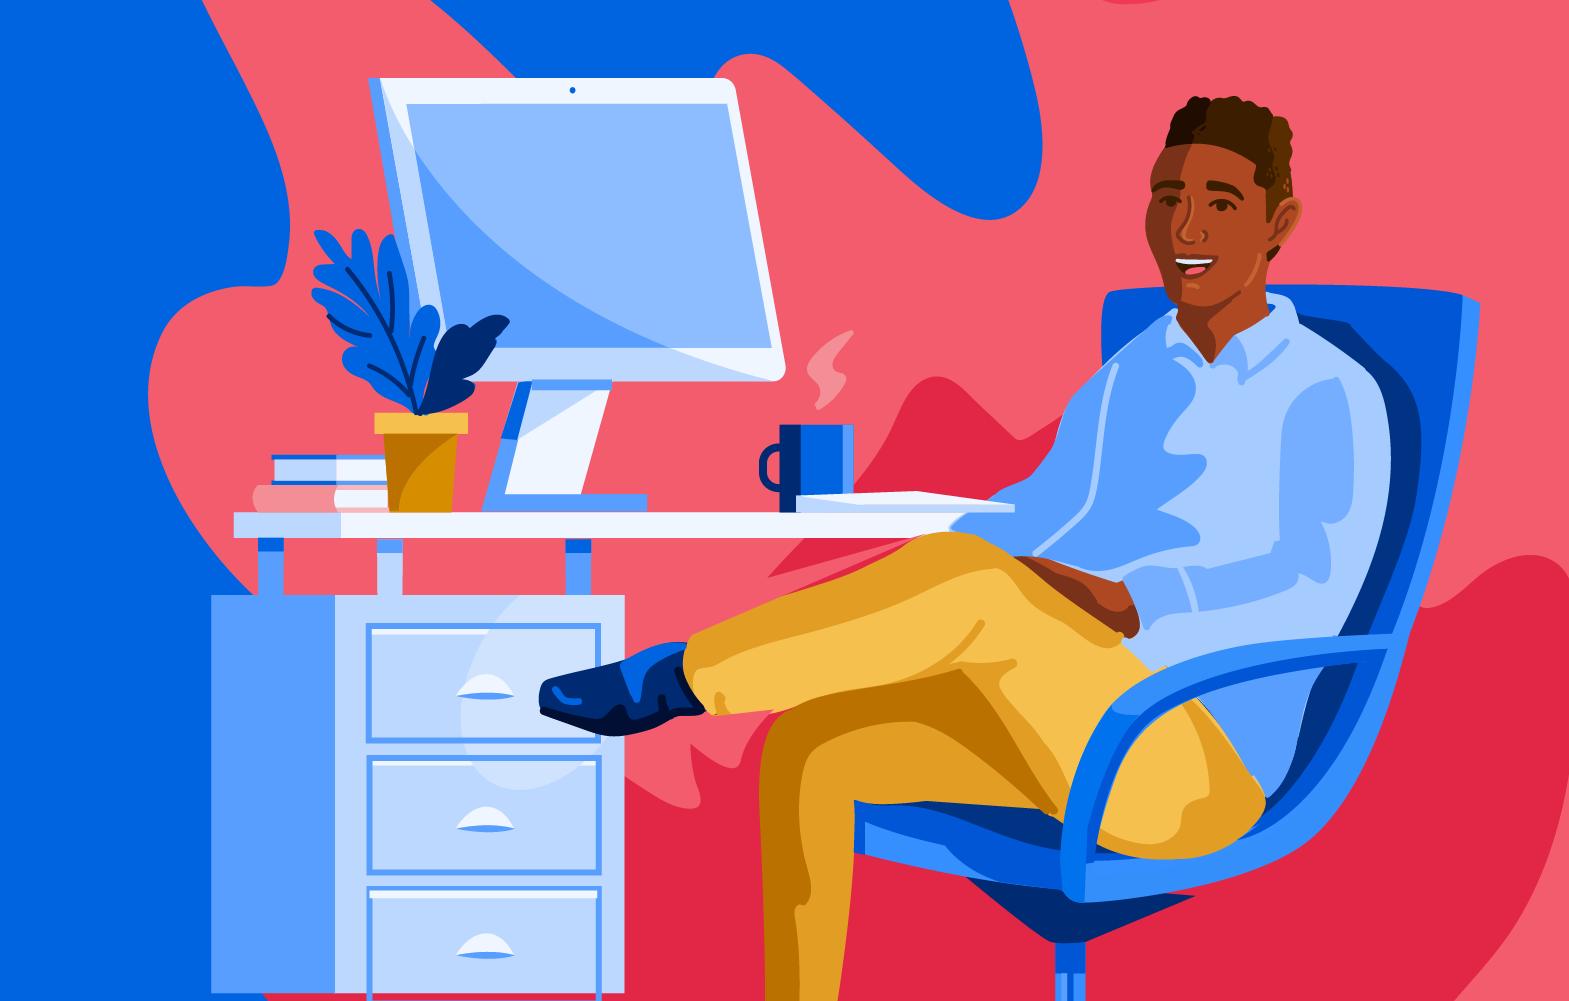 Illustration of student sitting at desk